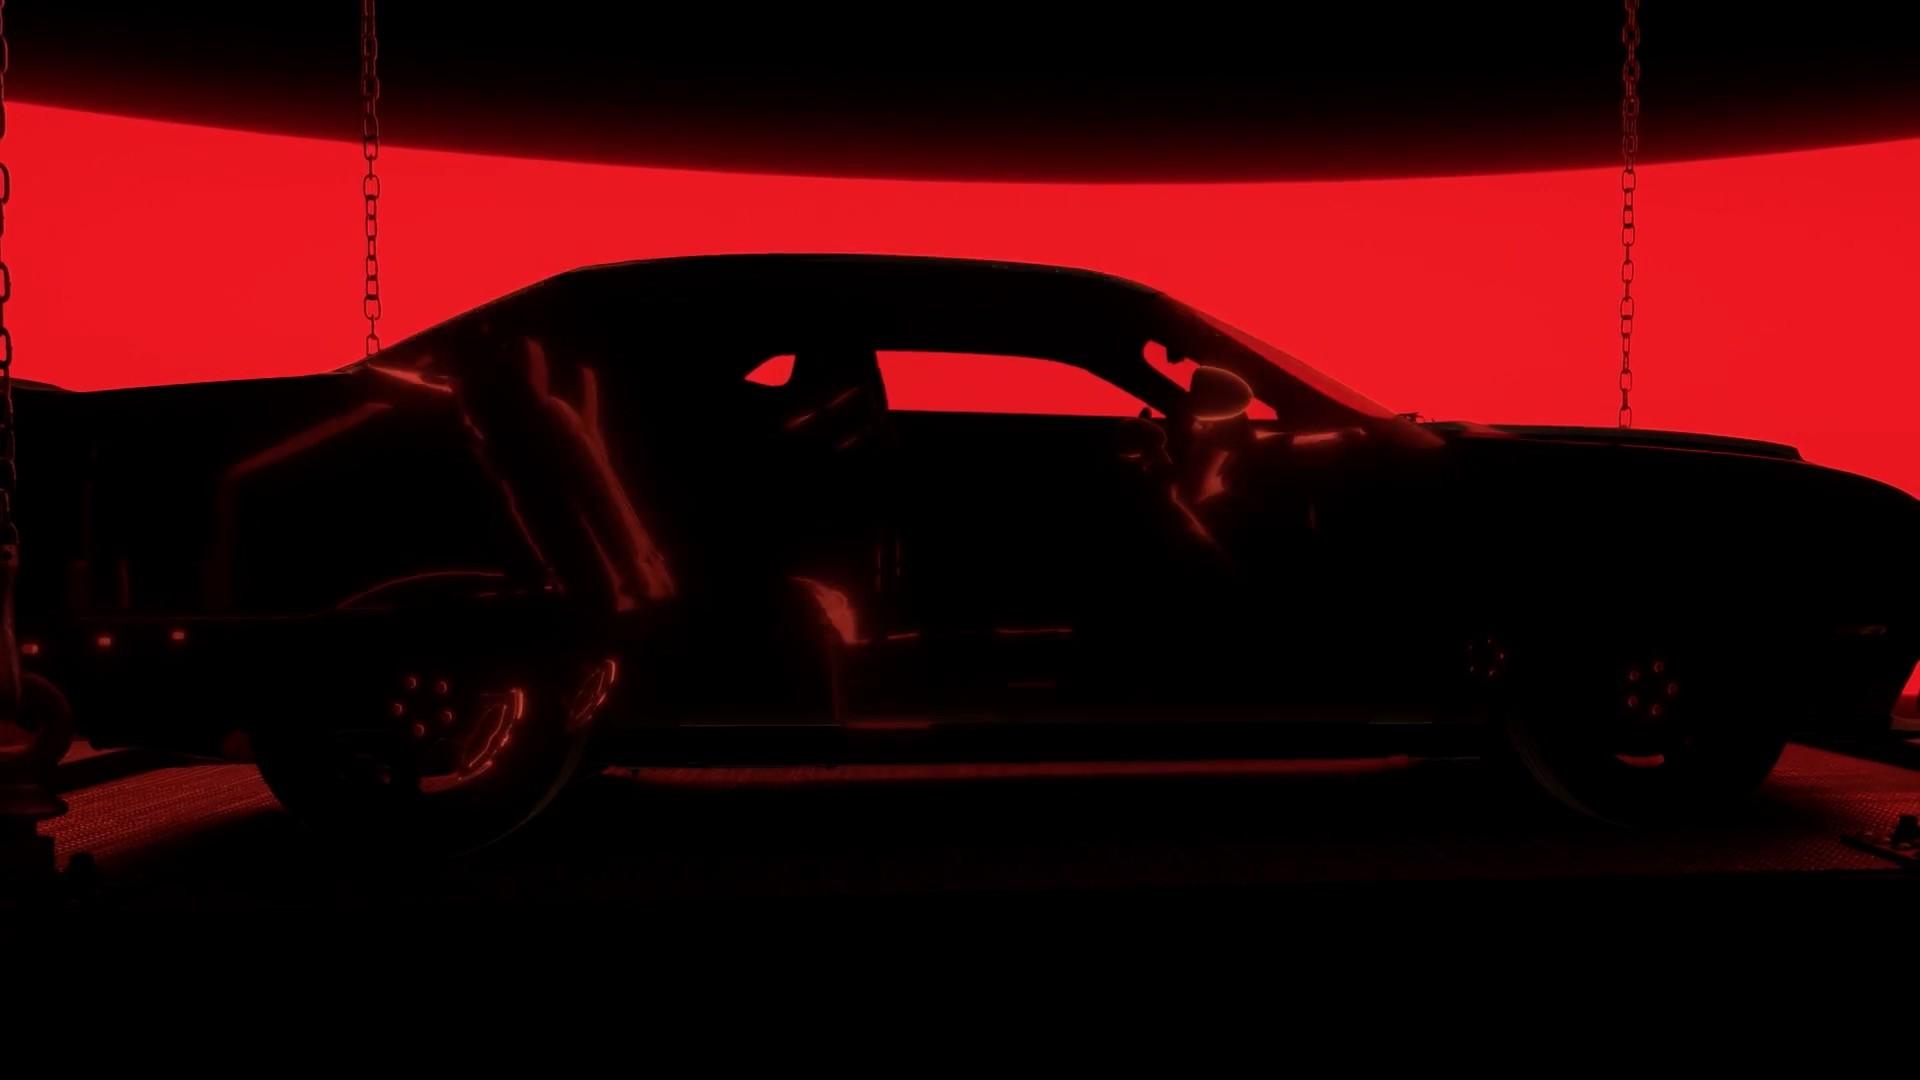 2018 Dodge Challenger SRT Demon Teaser Video 2 Is All About Weight ...